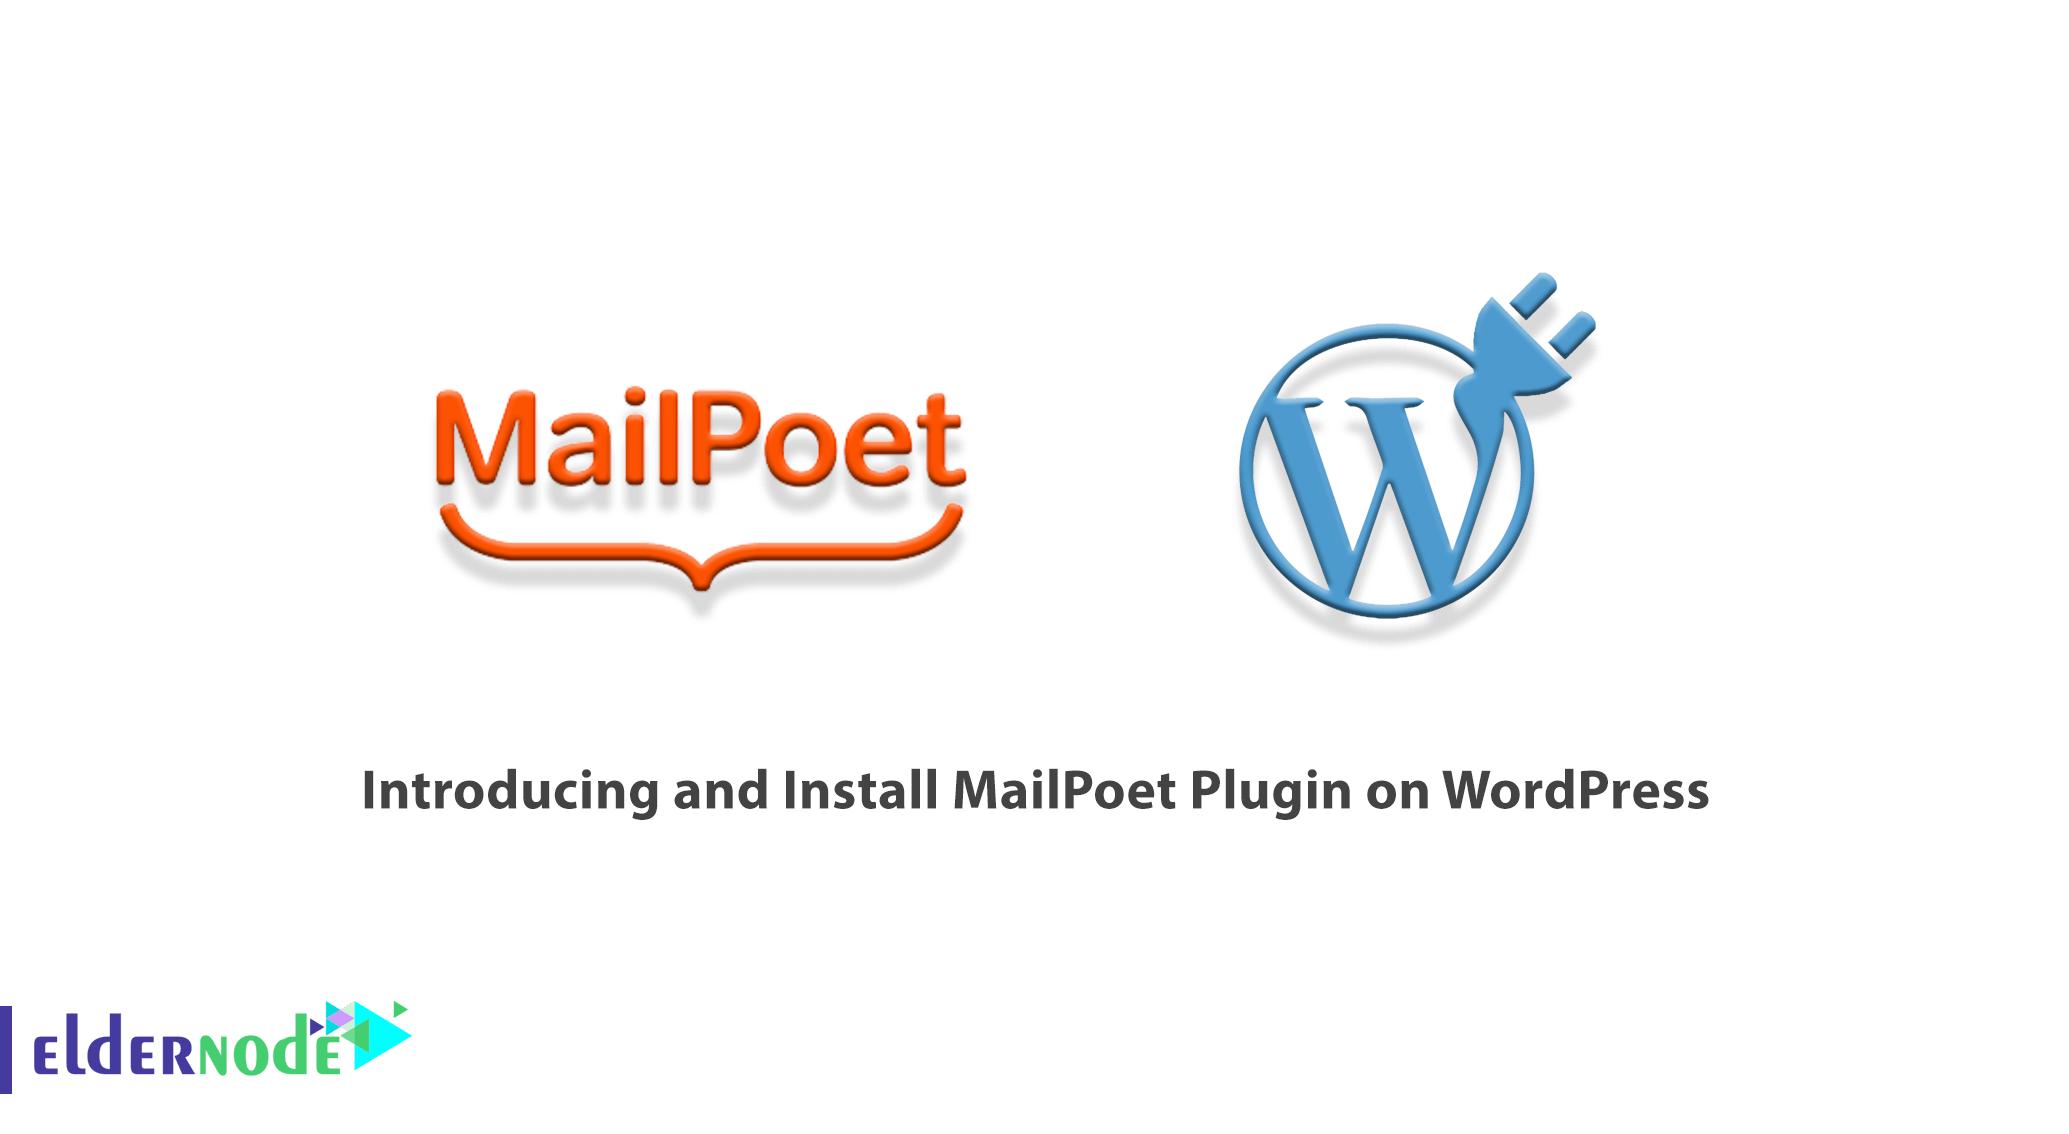 Introducing and Install MailPoet Plugin on WordPress